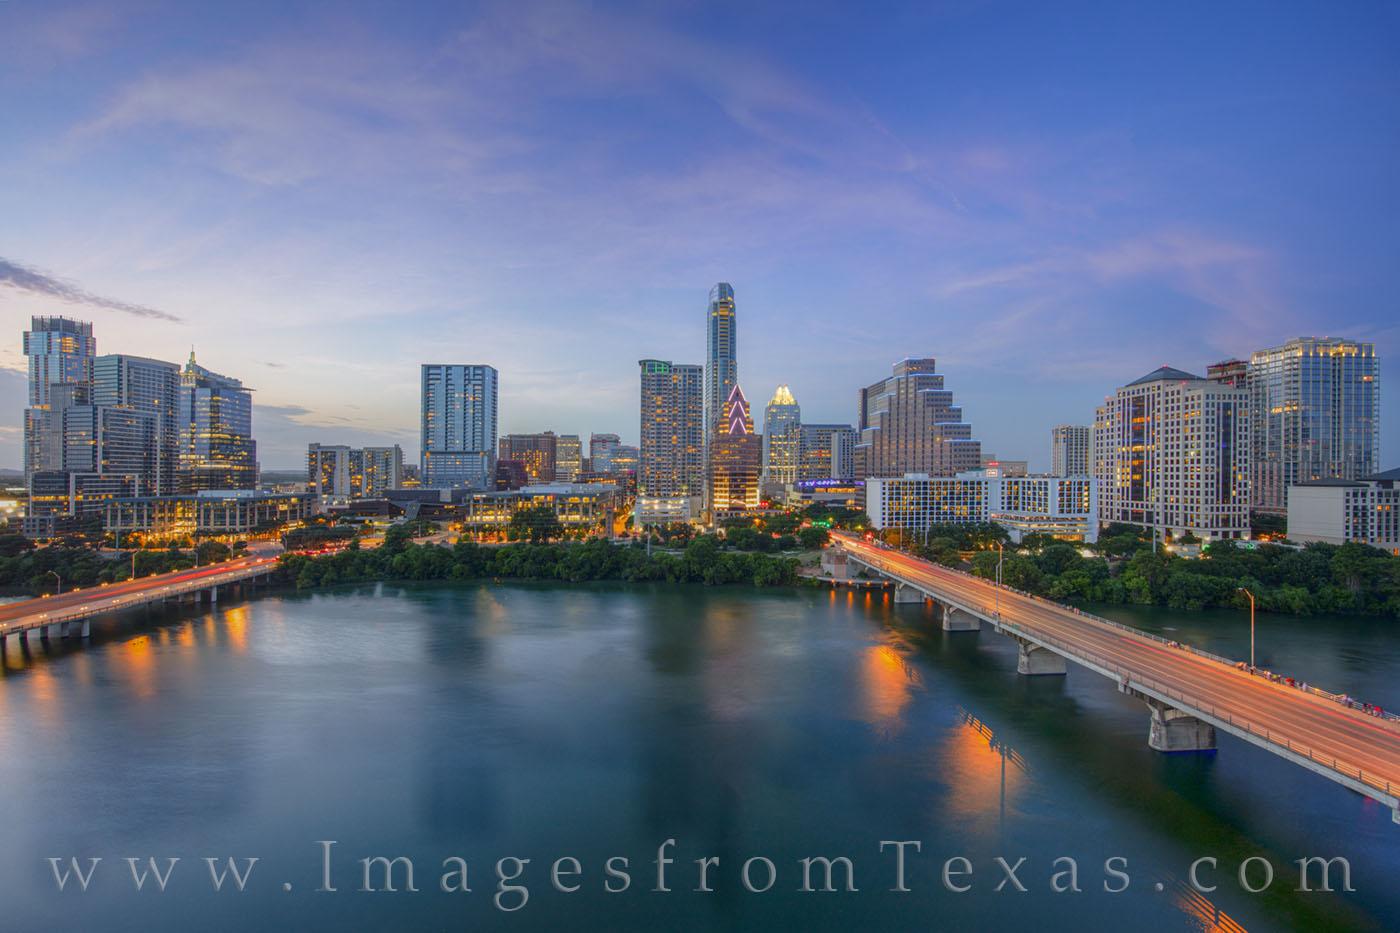 austin skyline, austin, downtown, ladybird lake, congress bridge, first street bridge, austonian, frost tower, evening, sunset, afternoon, hyatt, photo